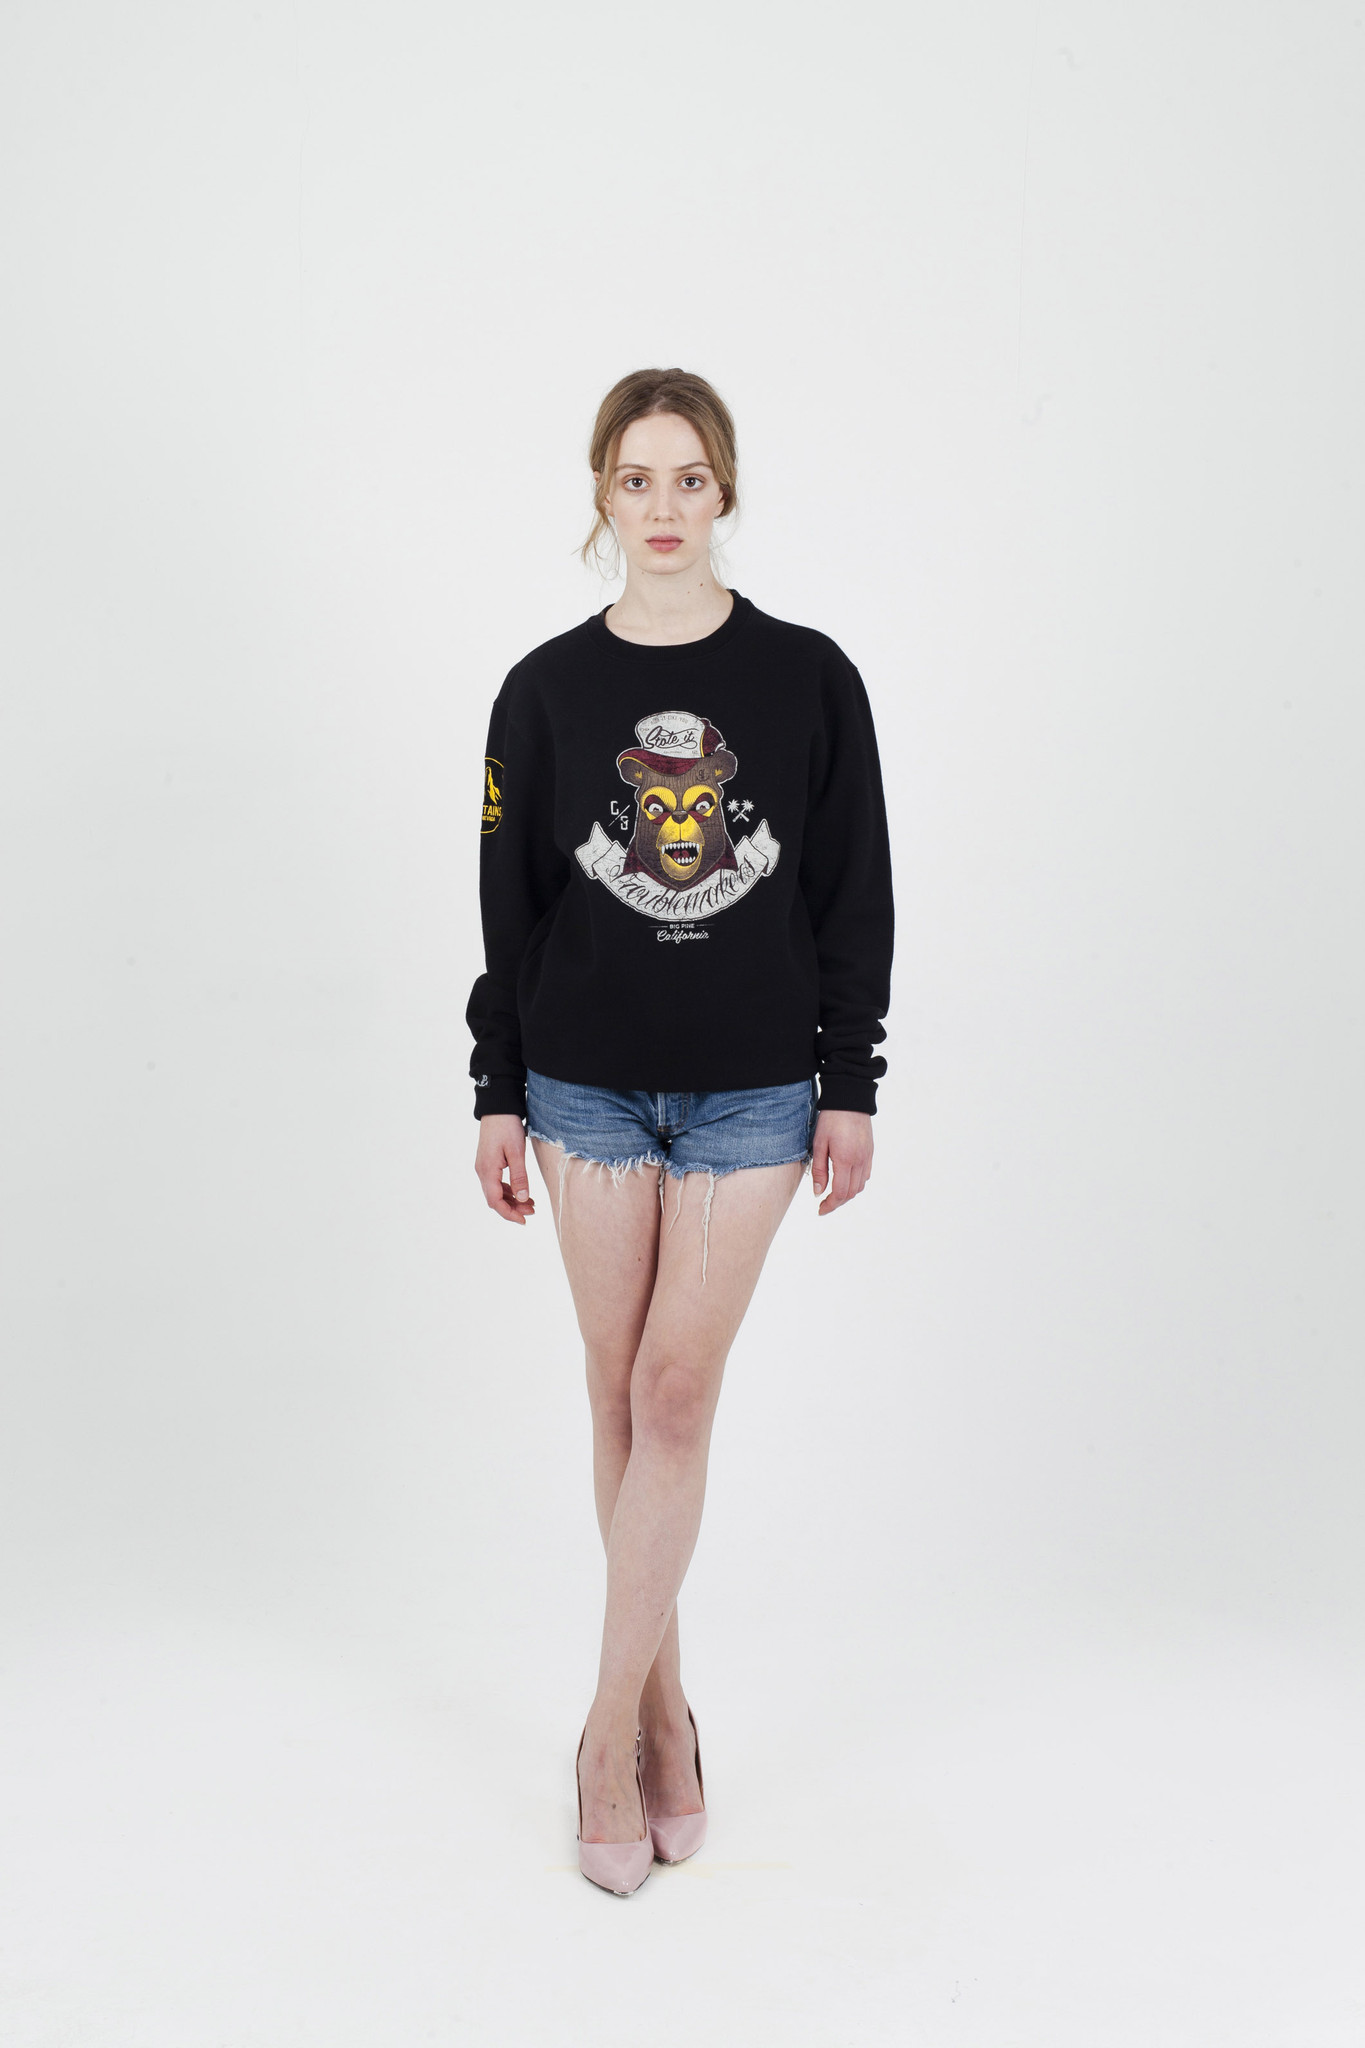 Nine Lives 'Teddy' Sweater